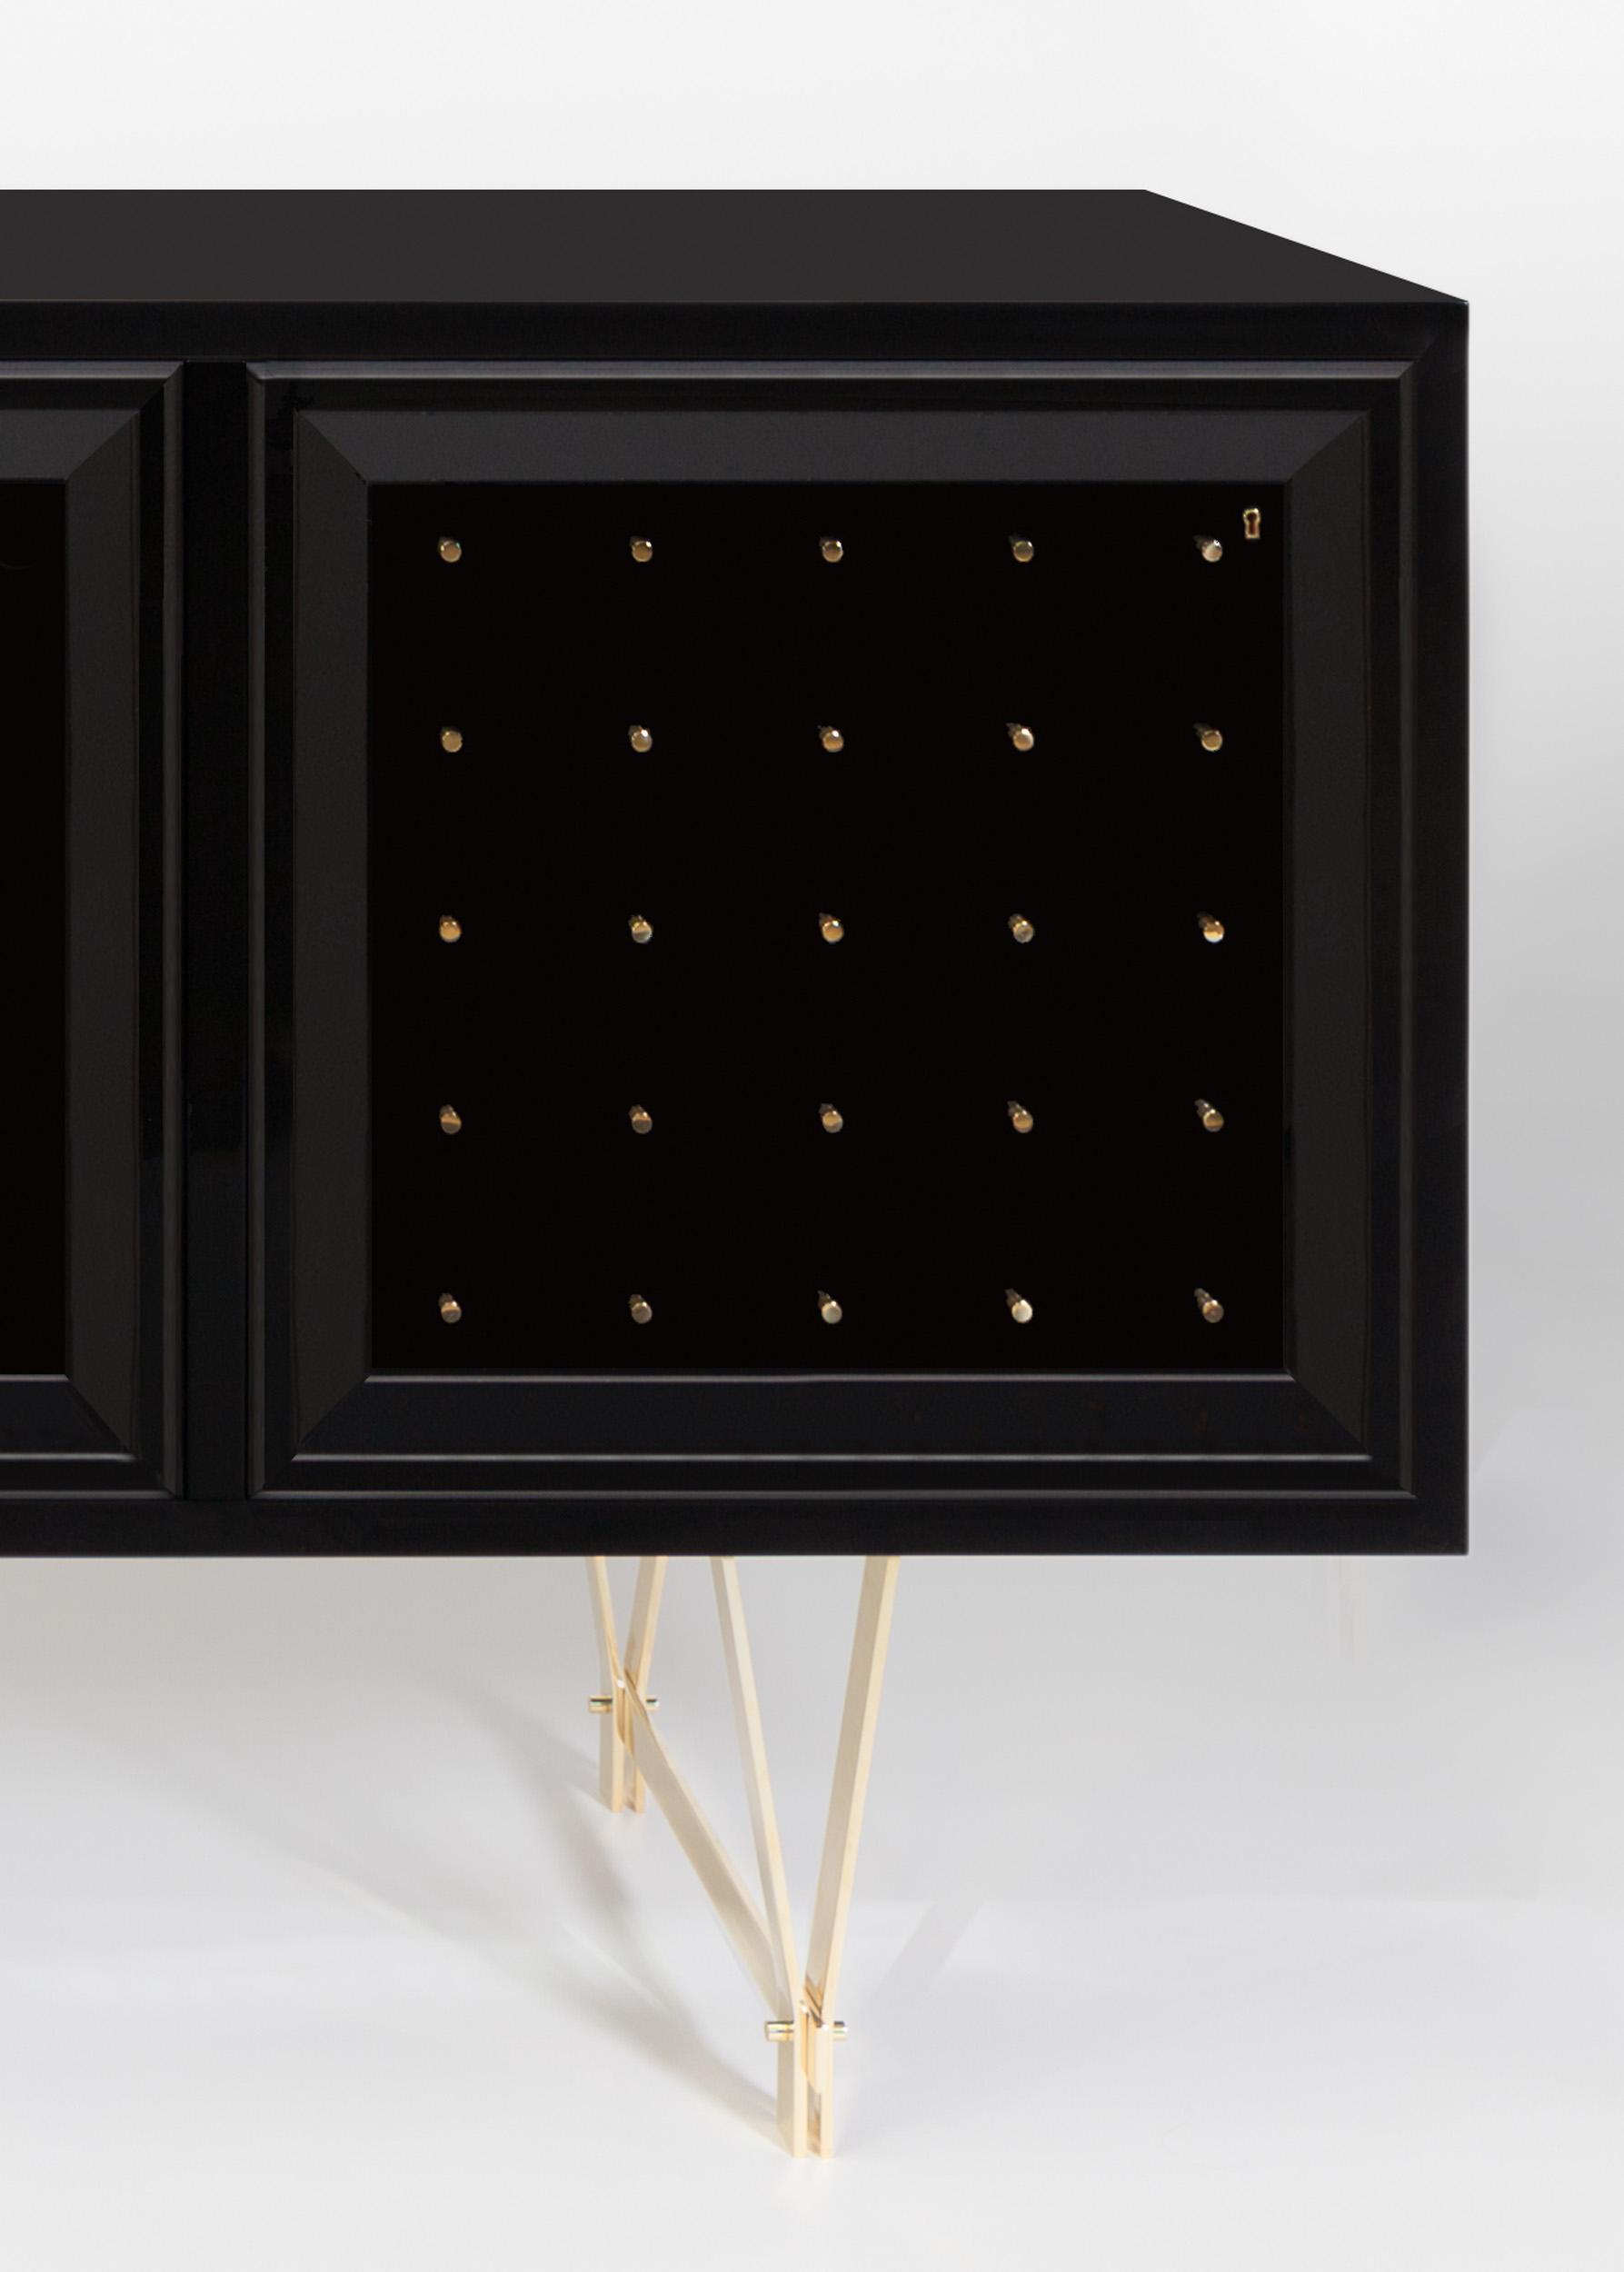 Fabricated by Vogue Furniture in Royal Oak, MI.